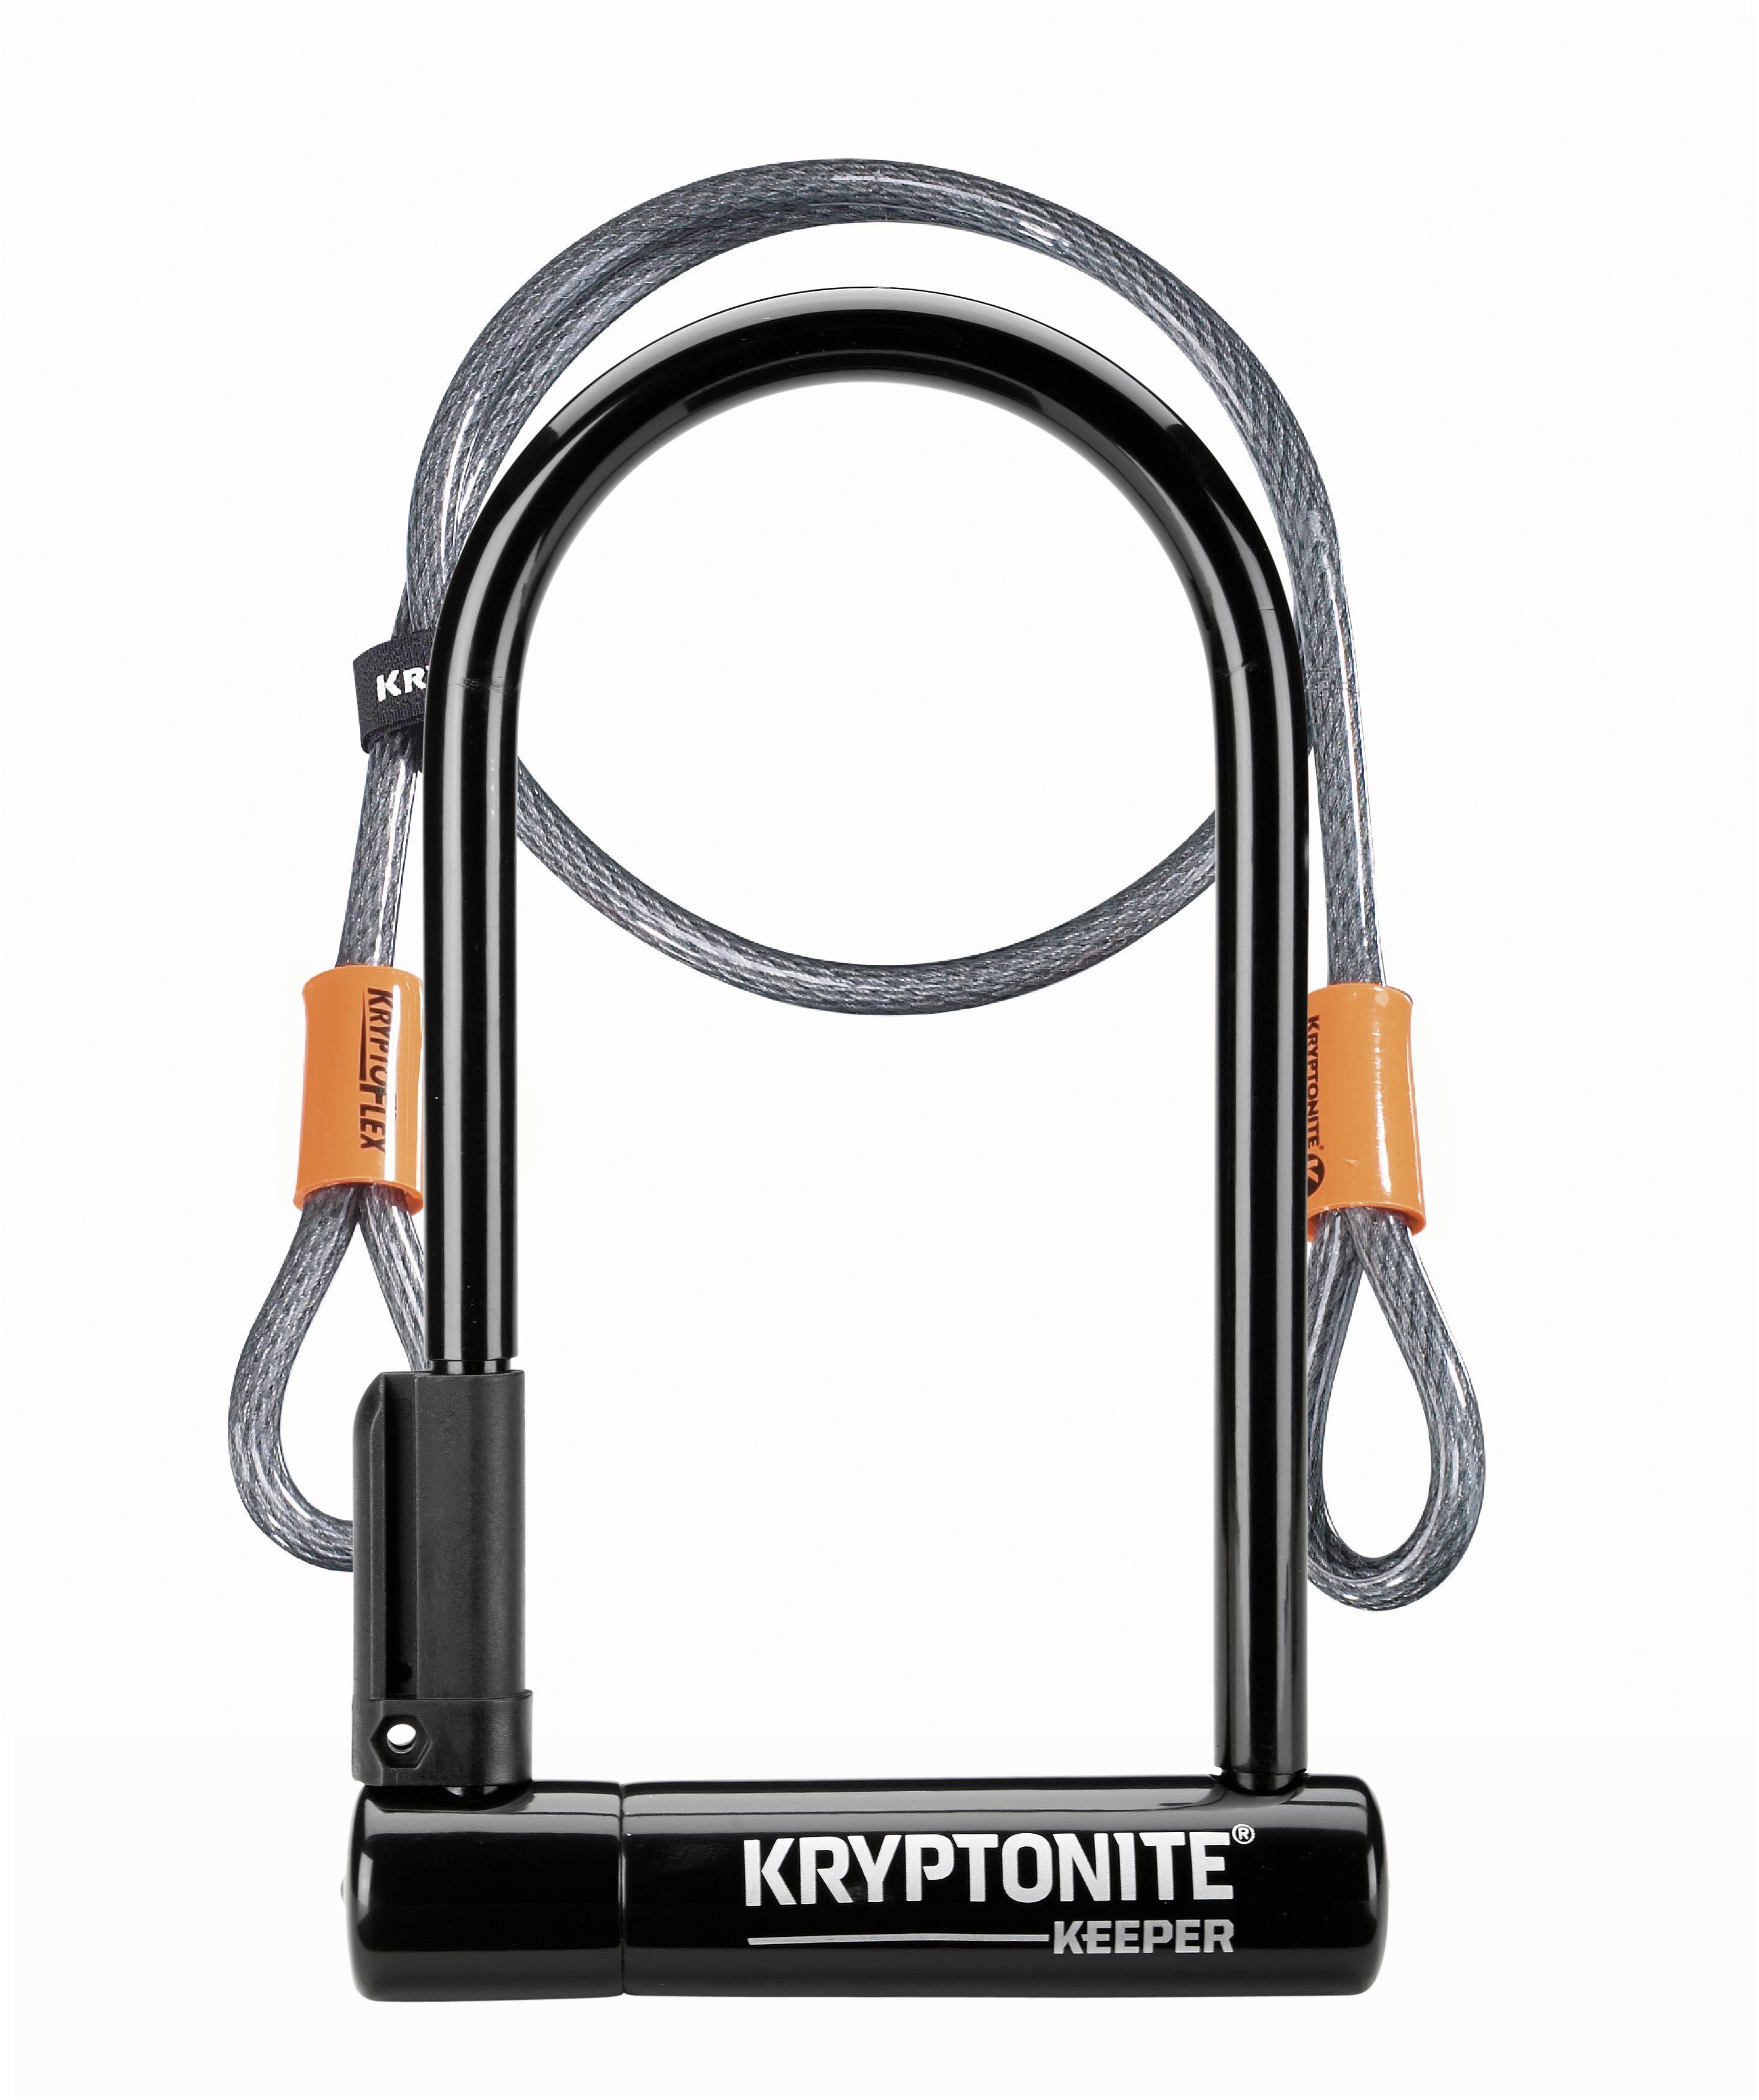 Kryptonite Keeper 12 Std U Lock with bracket